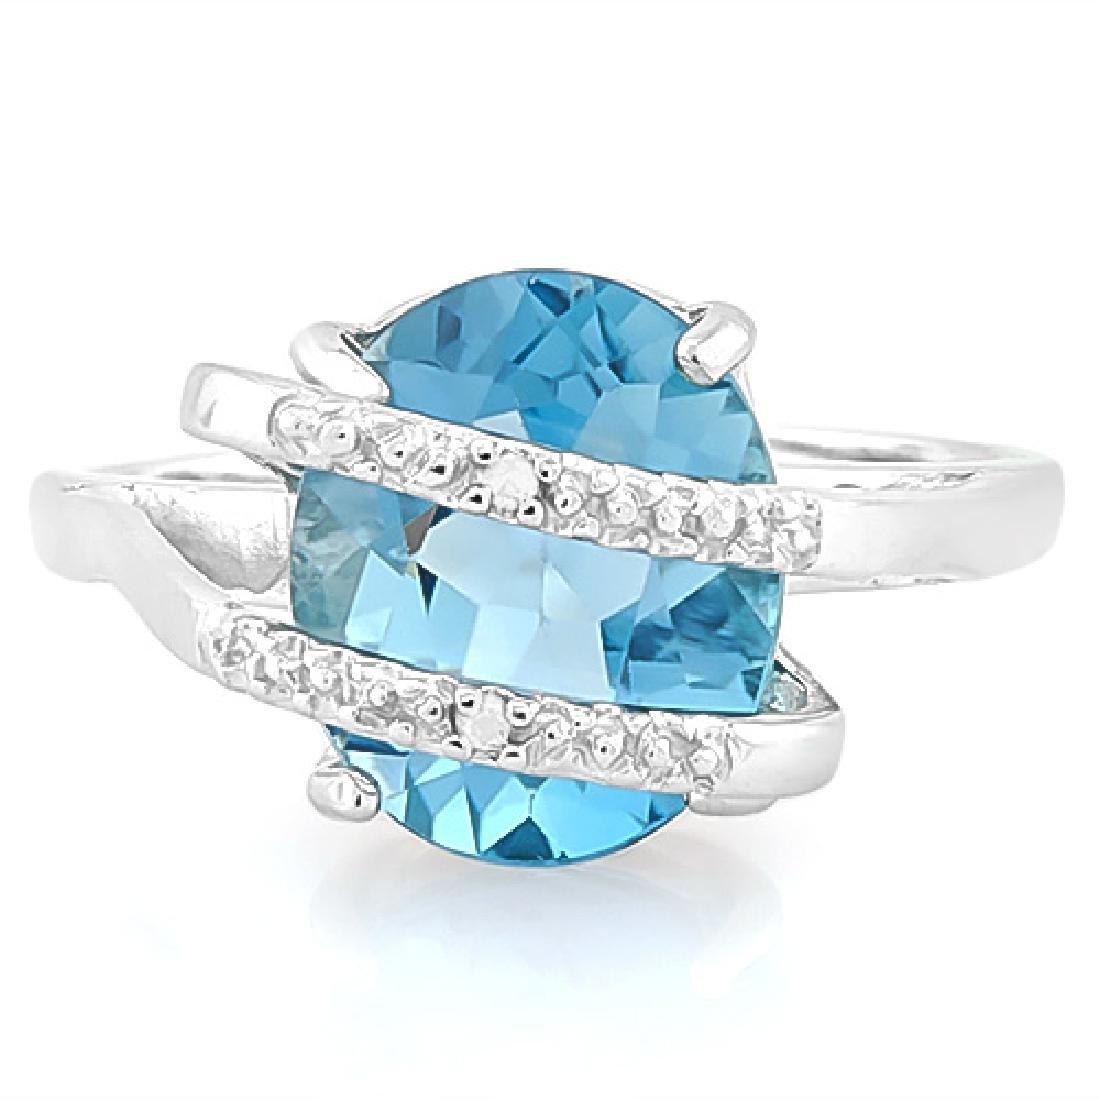 4 4/5 CARAT BABY SWISS BLUE TOPAZ & DIAMOND 925 STERLIN